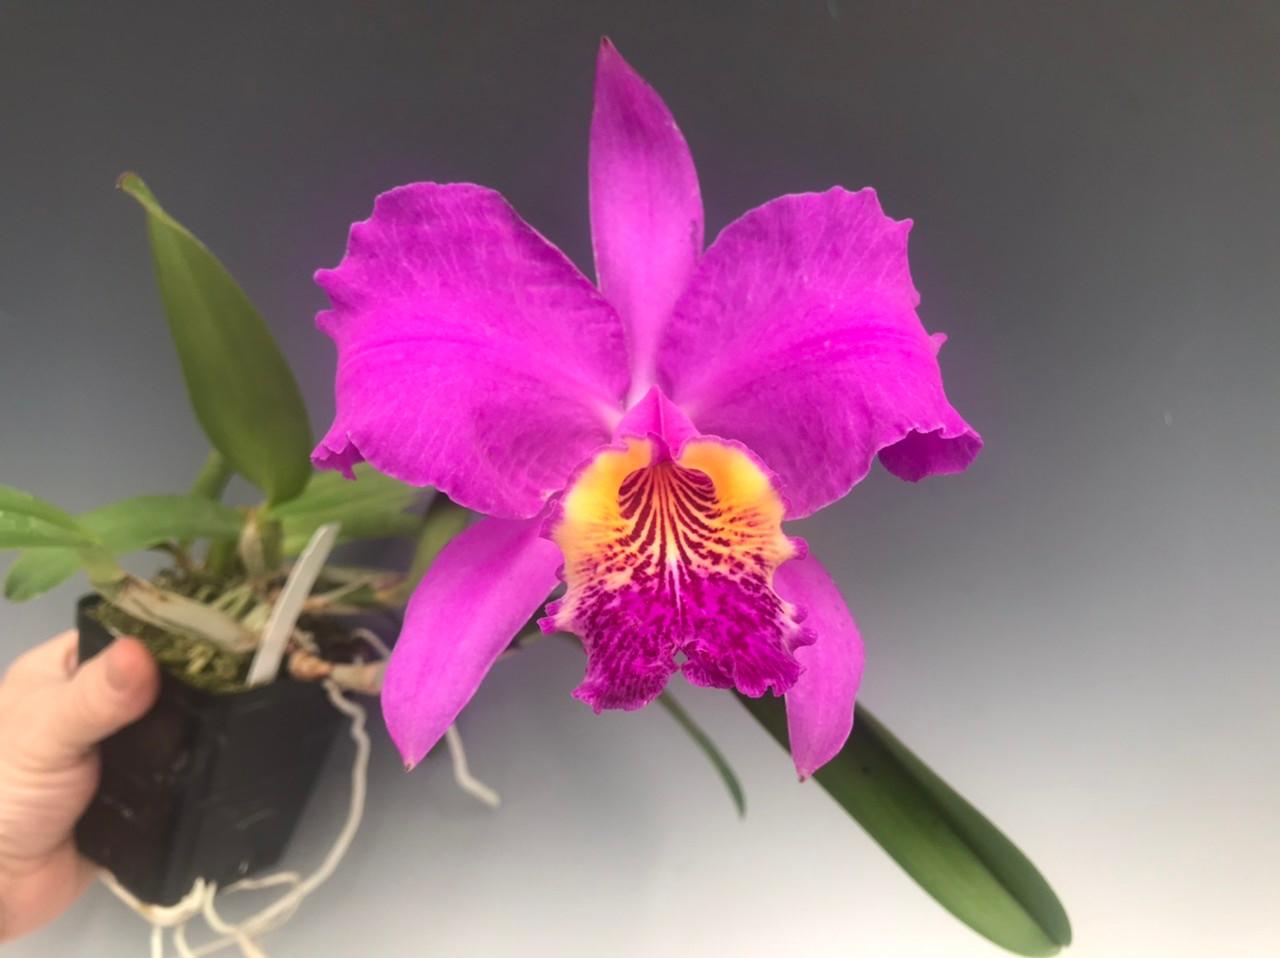 Cattleya lueddemanniana var. rubra - OrchidWeb